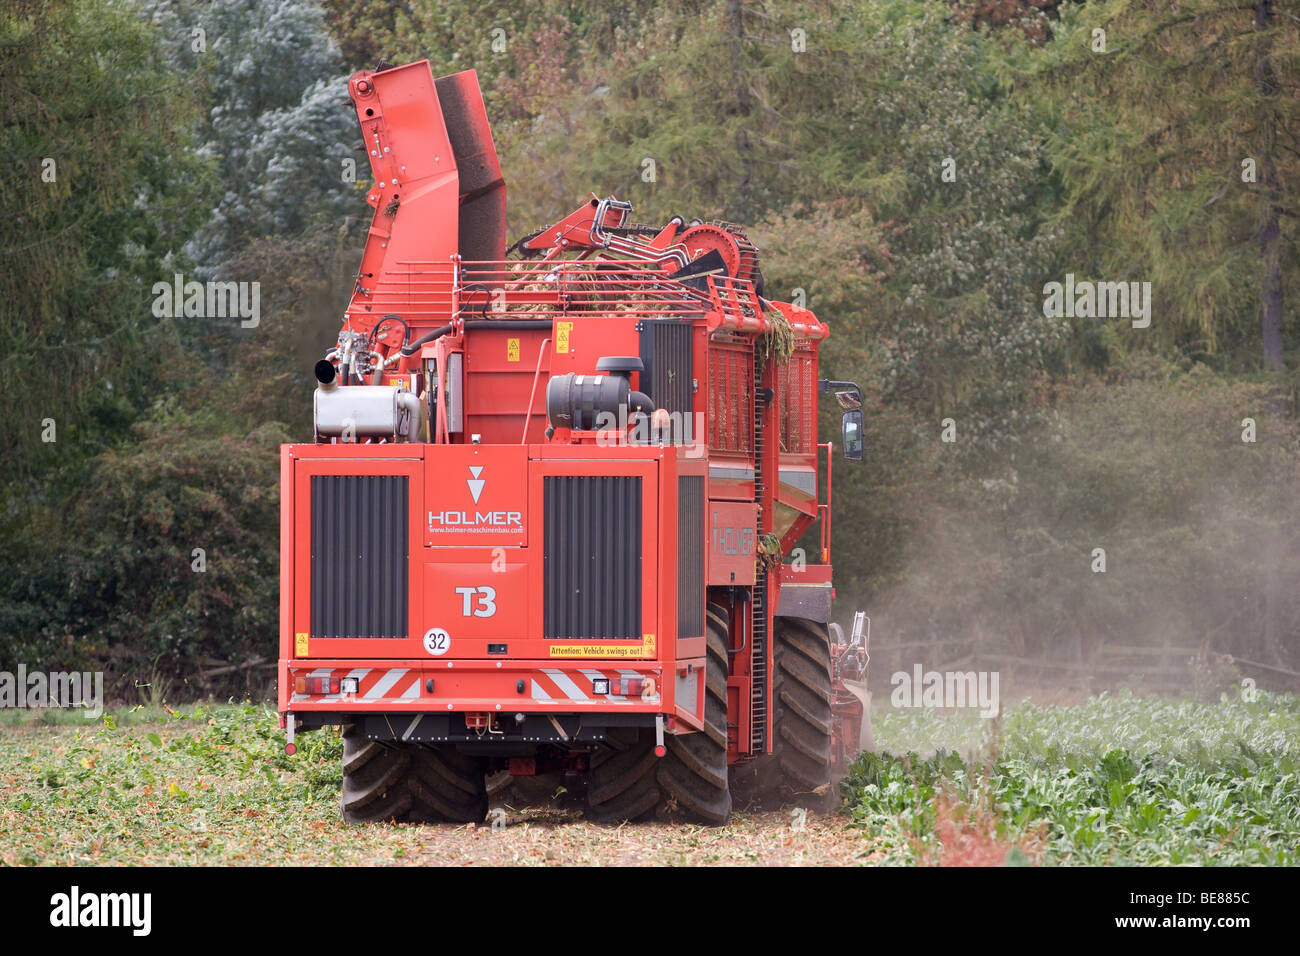 Harvesting Sugar Beet - Stock Image